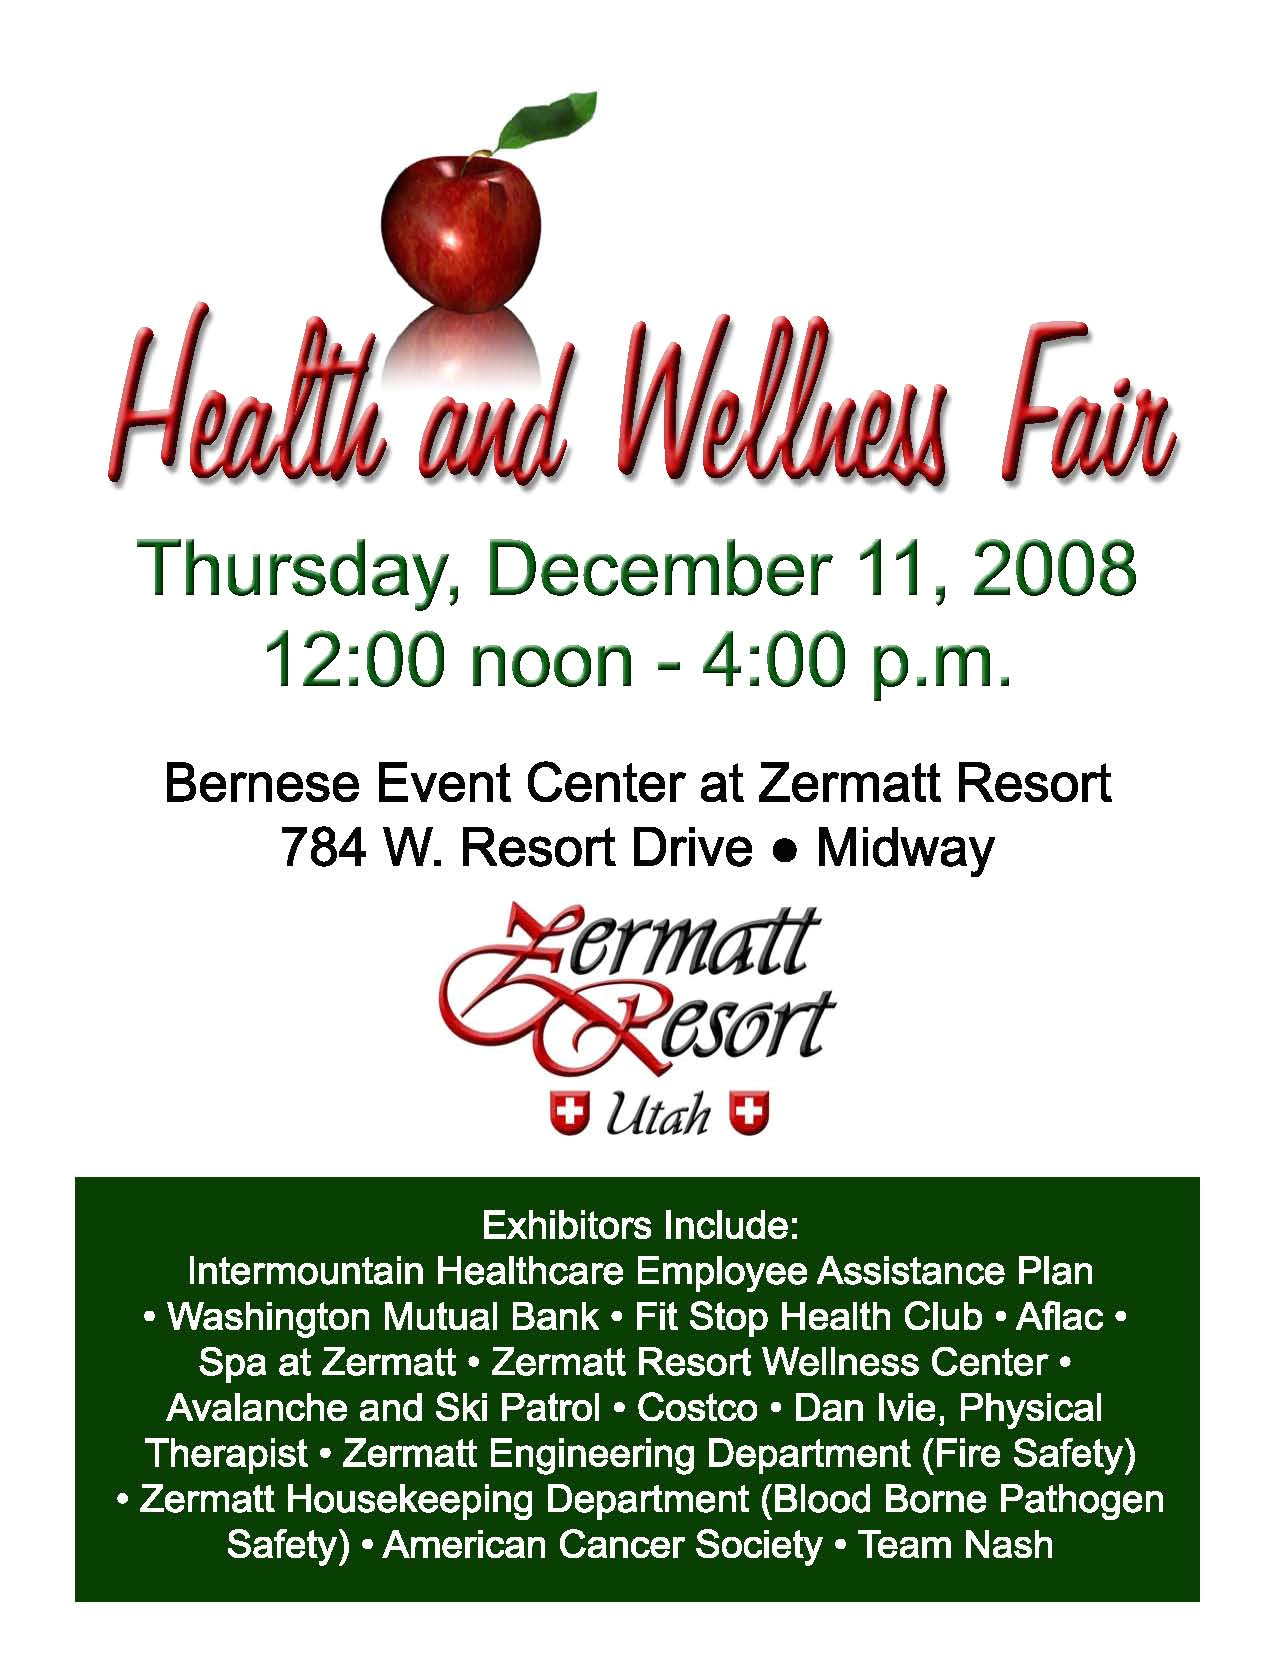 health and wellness fair at zermatt resort